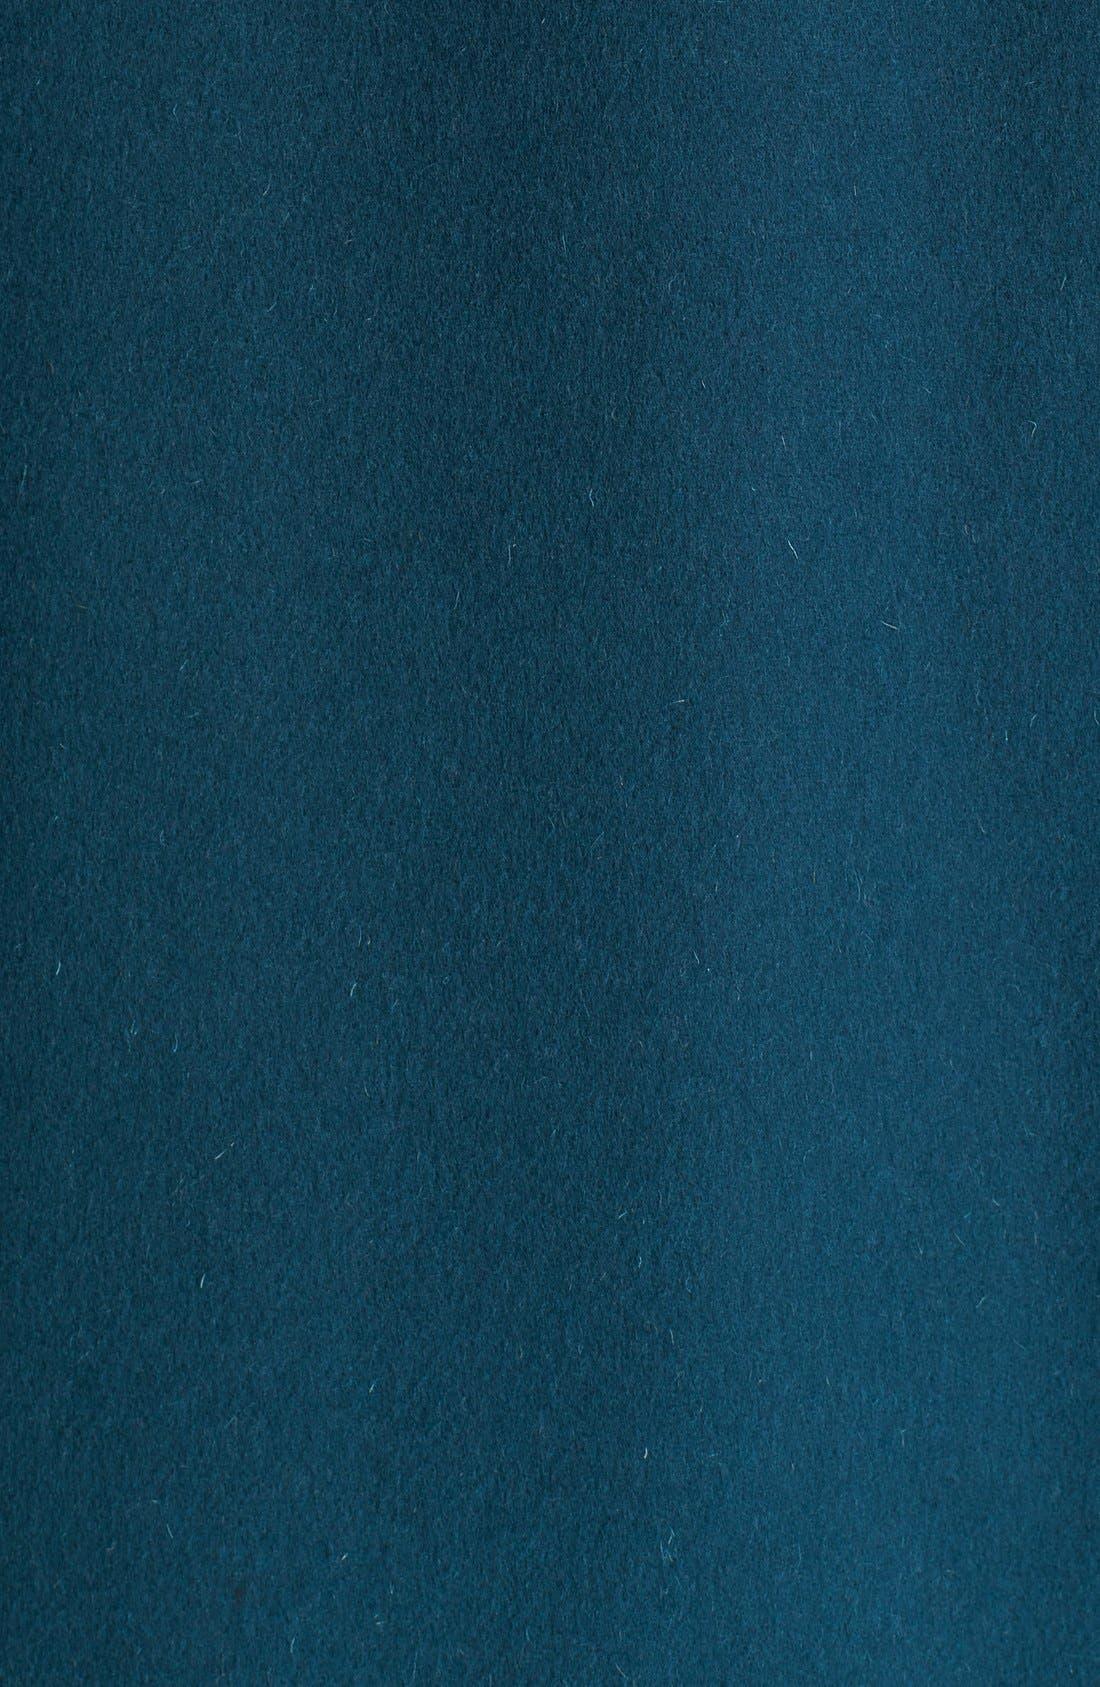 Alternate Image 3  - BurberryBrit 'Finsdale' WoolDuffleCoat